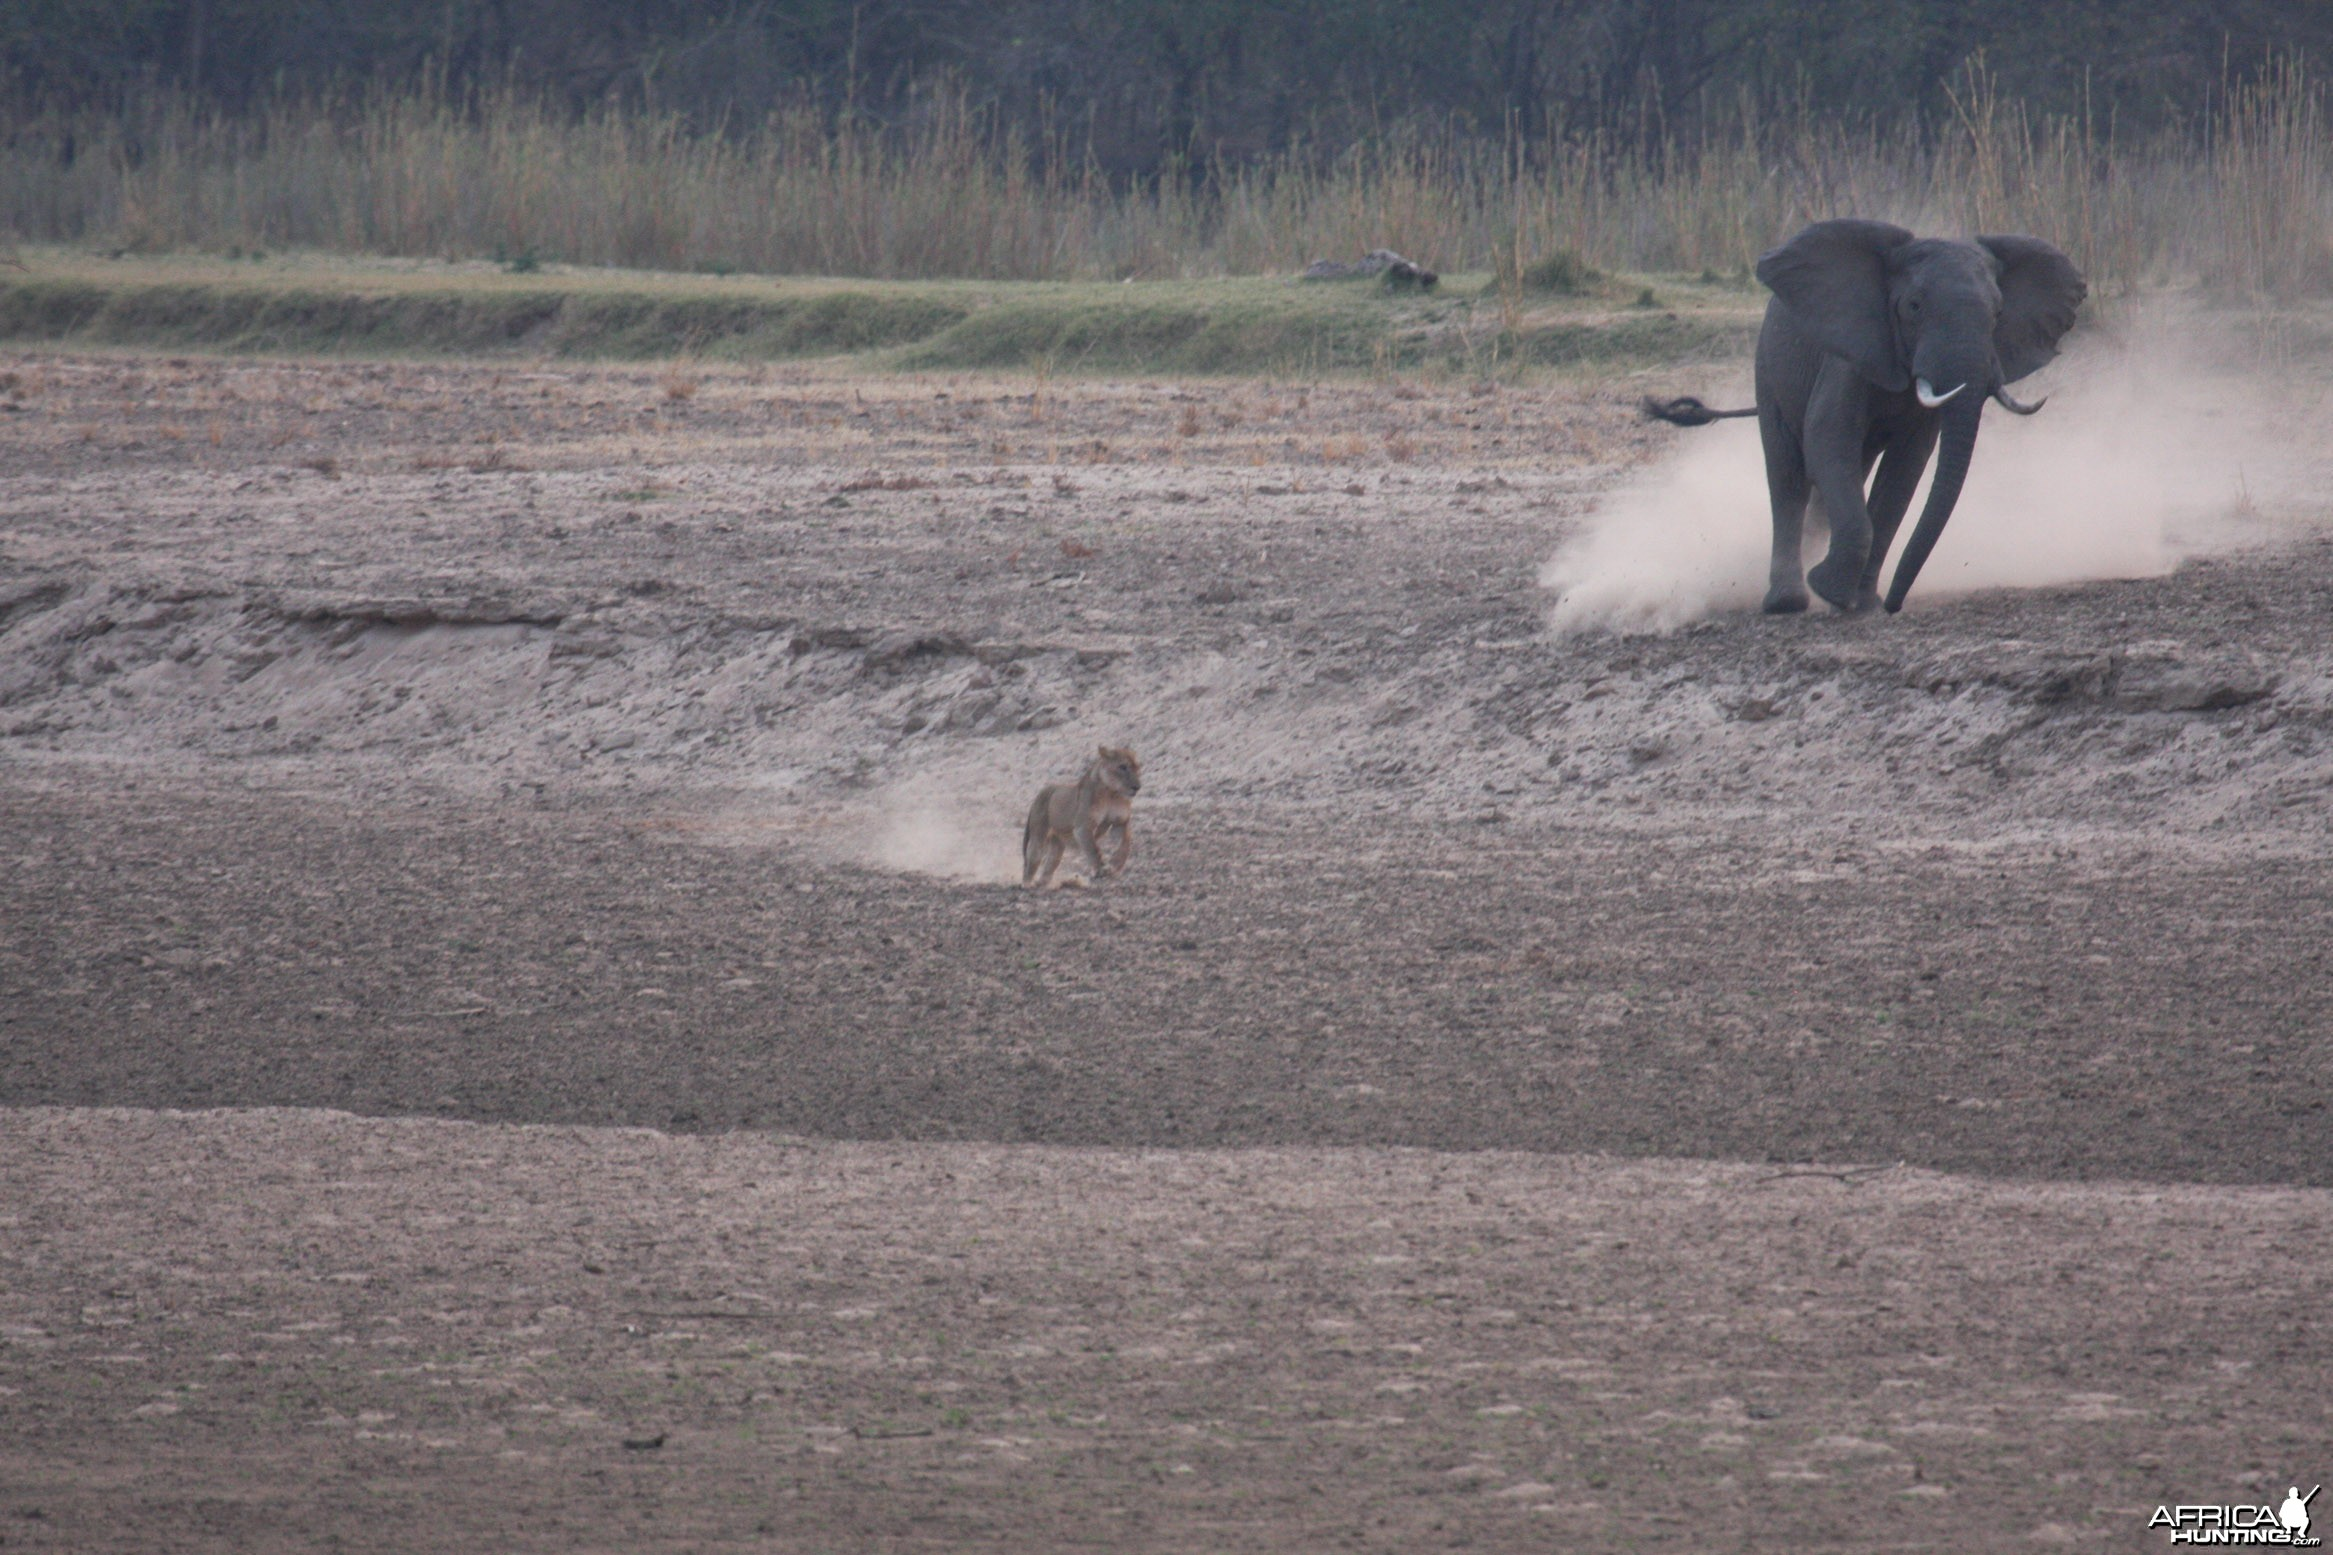 Ele chasing lions in Tanzania